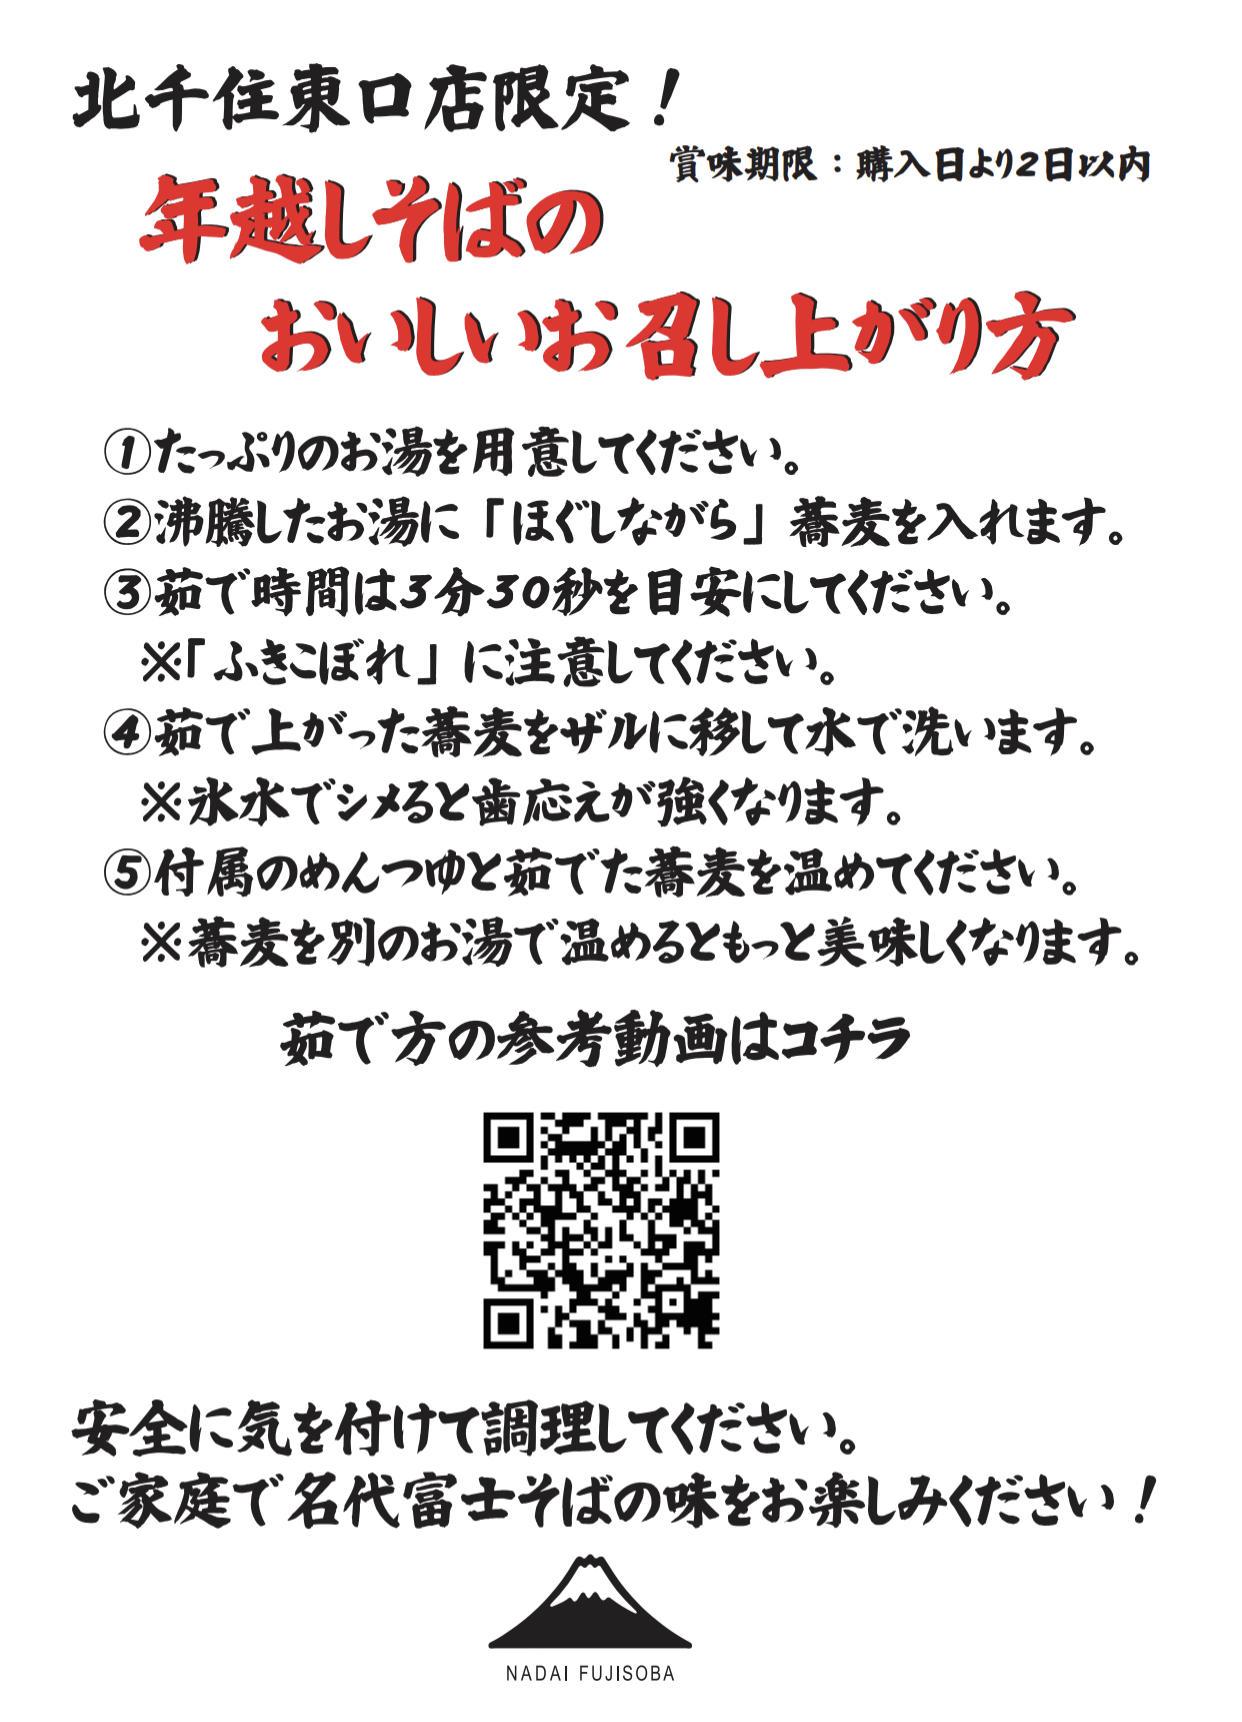 https://fujisoba.co.jp/news/assets/IMG_2765.jpg